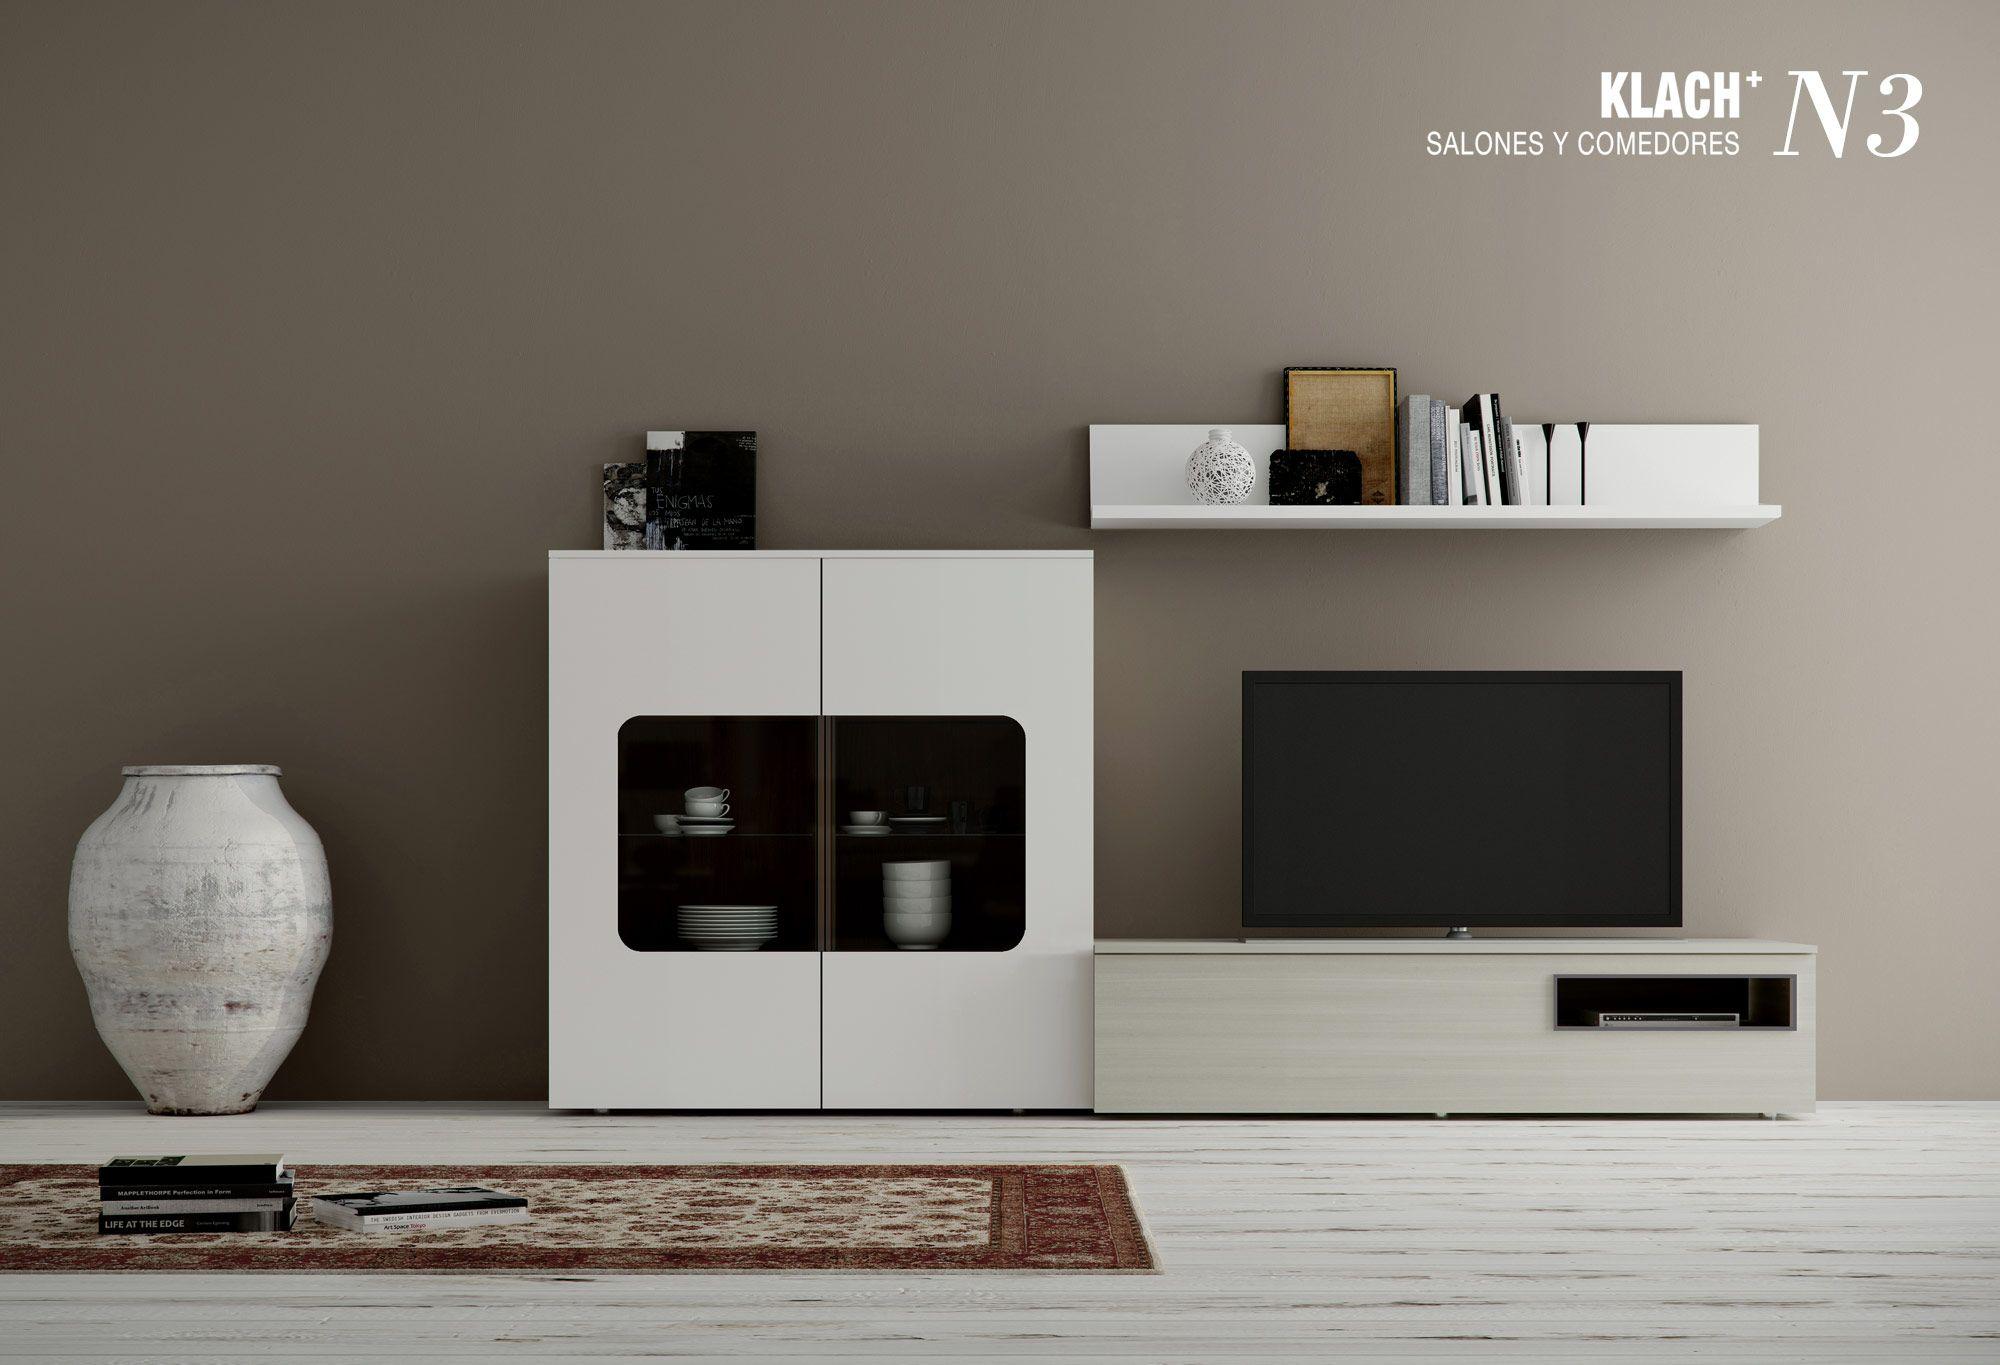 Klach n3 muebles hermida muebles de sal n y comedor mobiliario pinterest - Hermida muebles ...